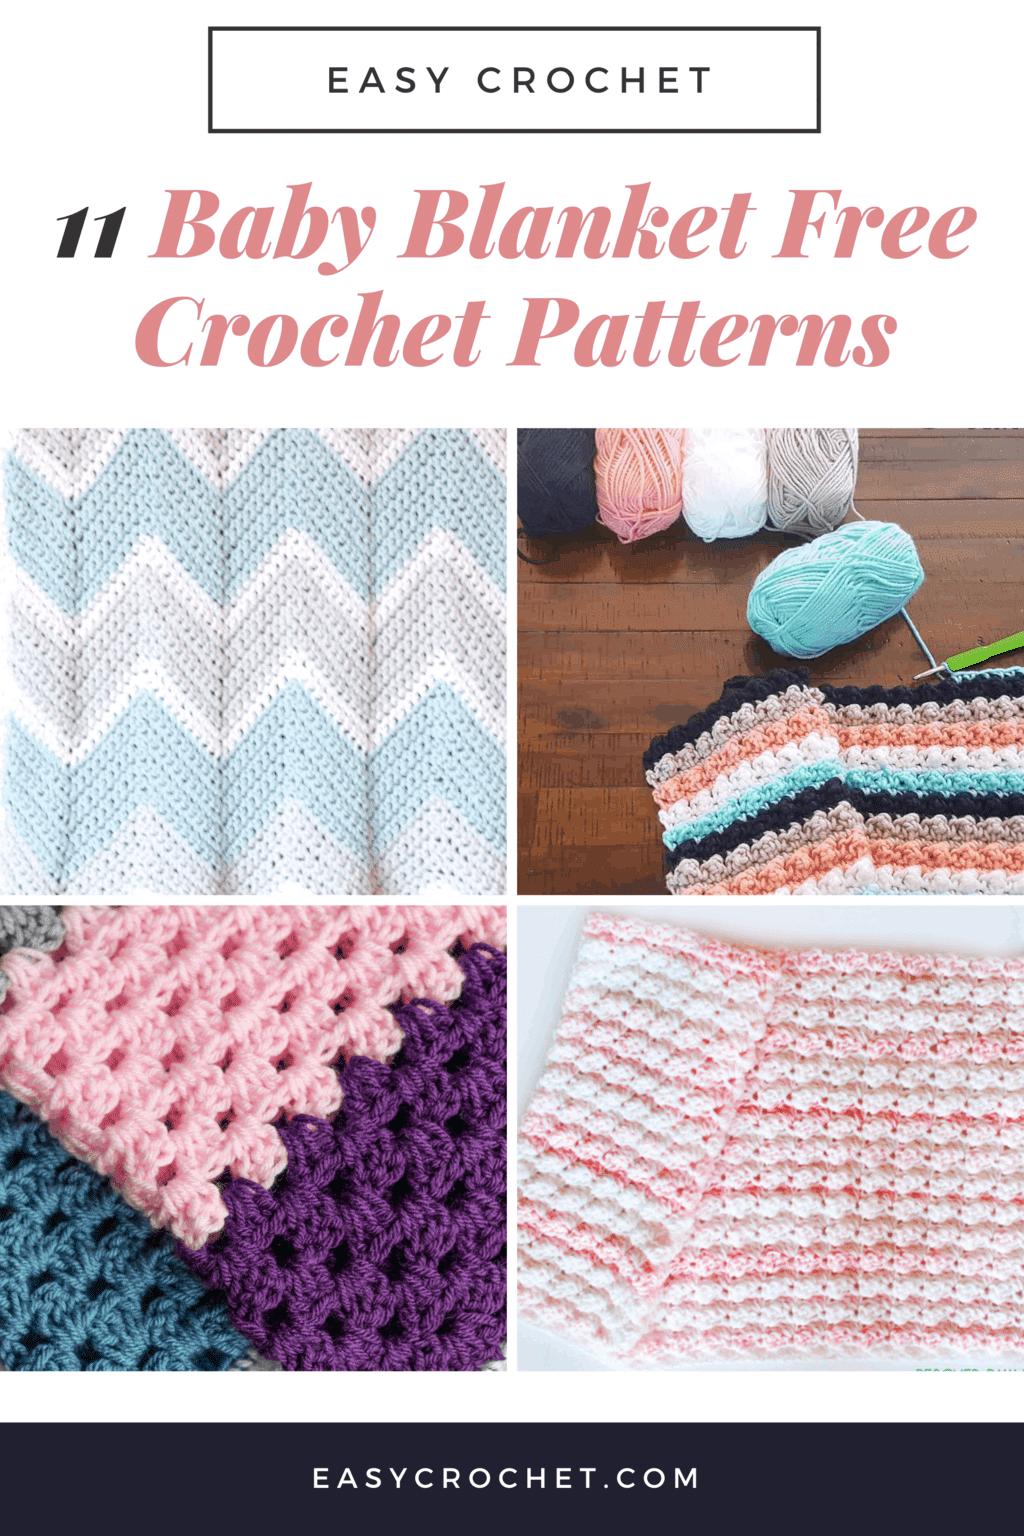 Easy to Crochet Baby Blanket Free Crochet Patterns